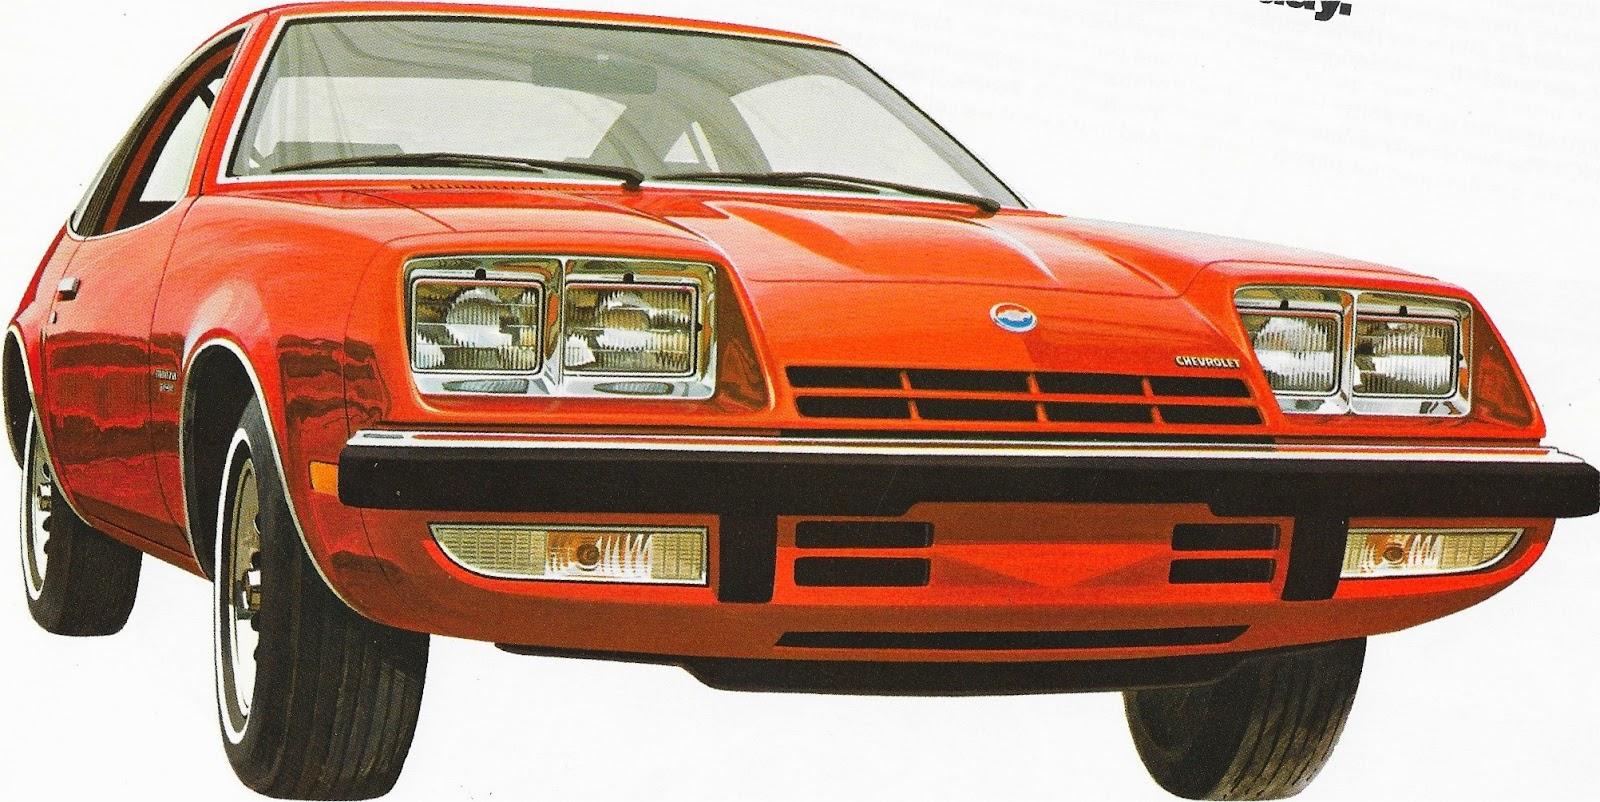 Old Cars Canada: May 2015